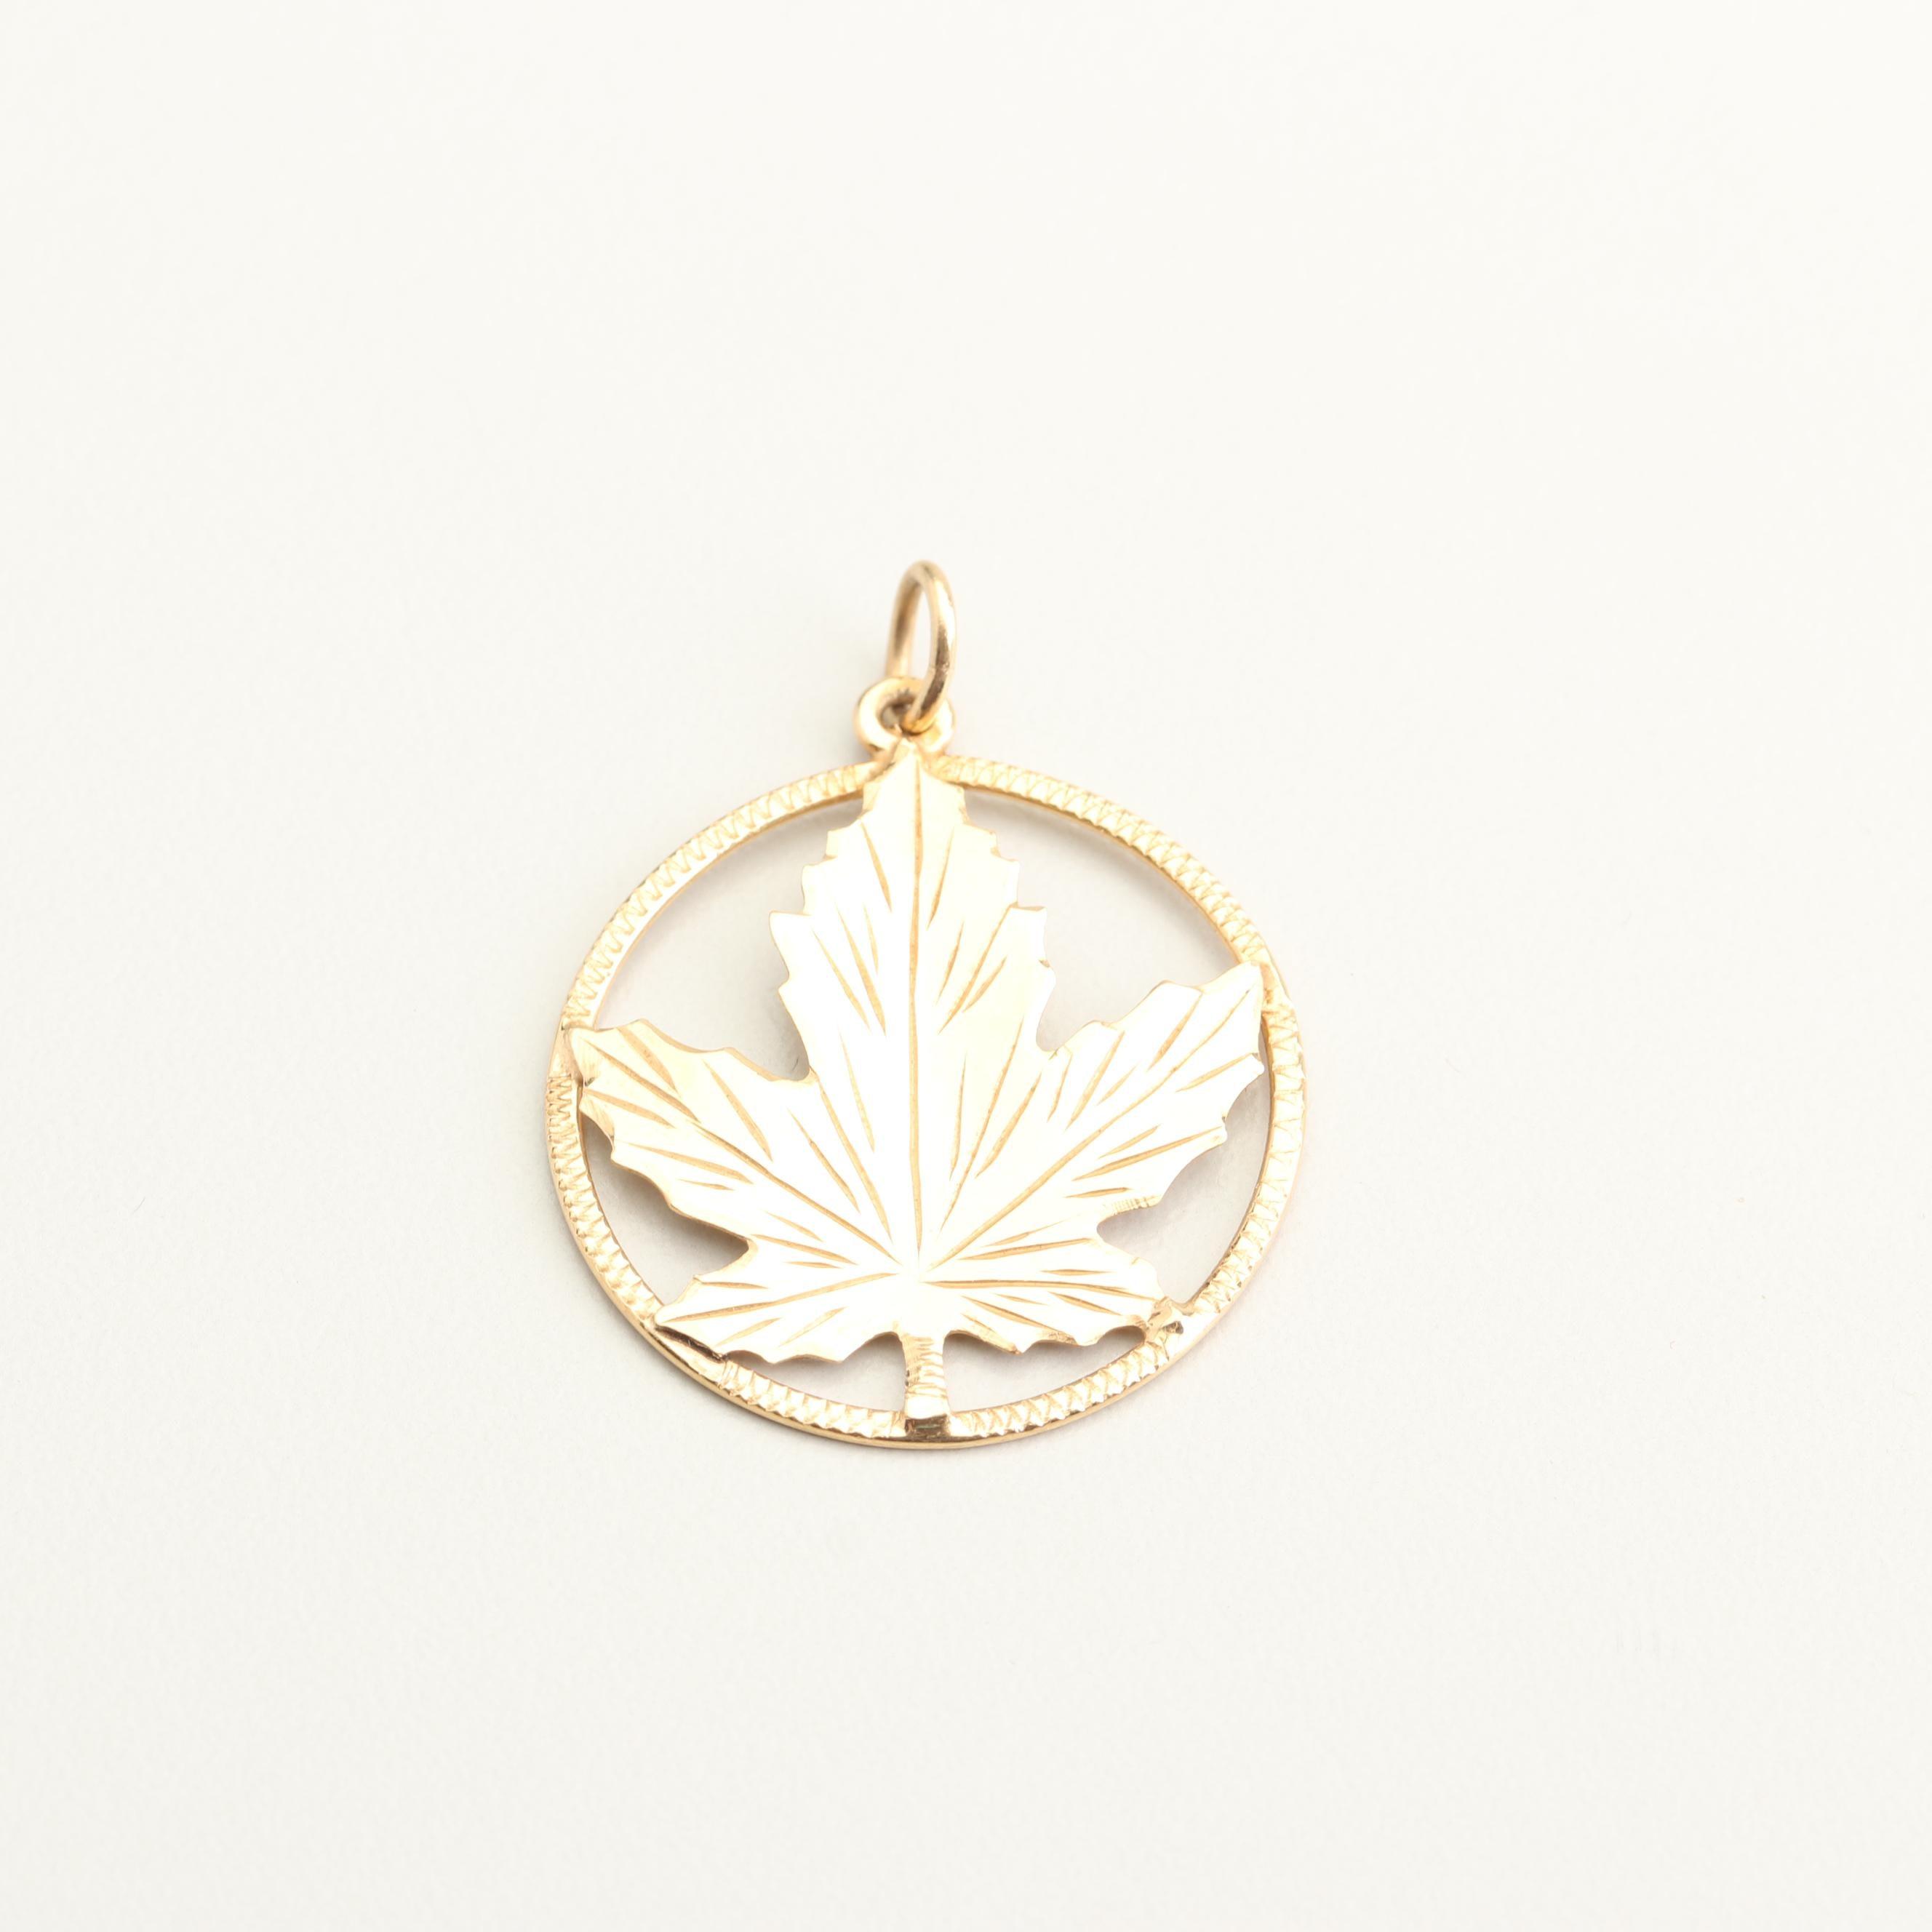 14K Yellow Gold Maple Leaf Pendant